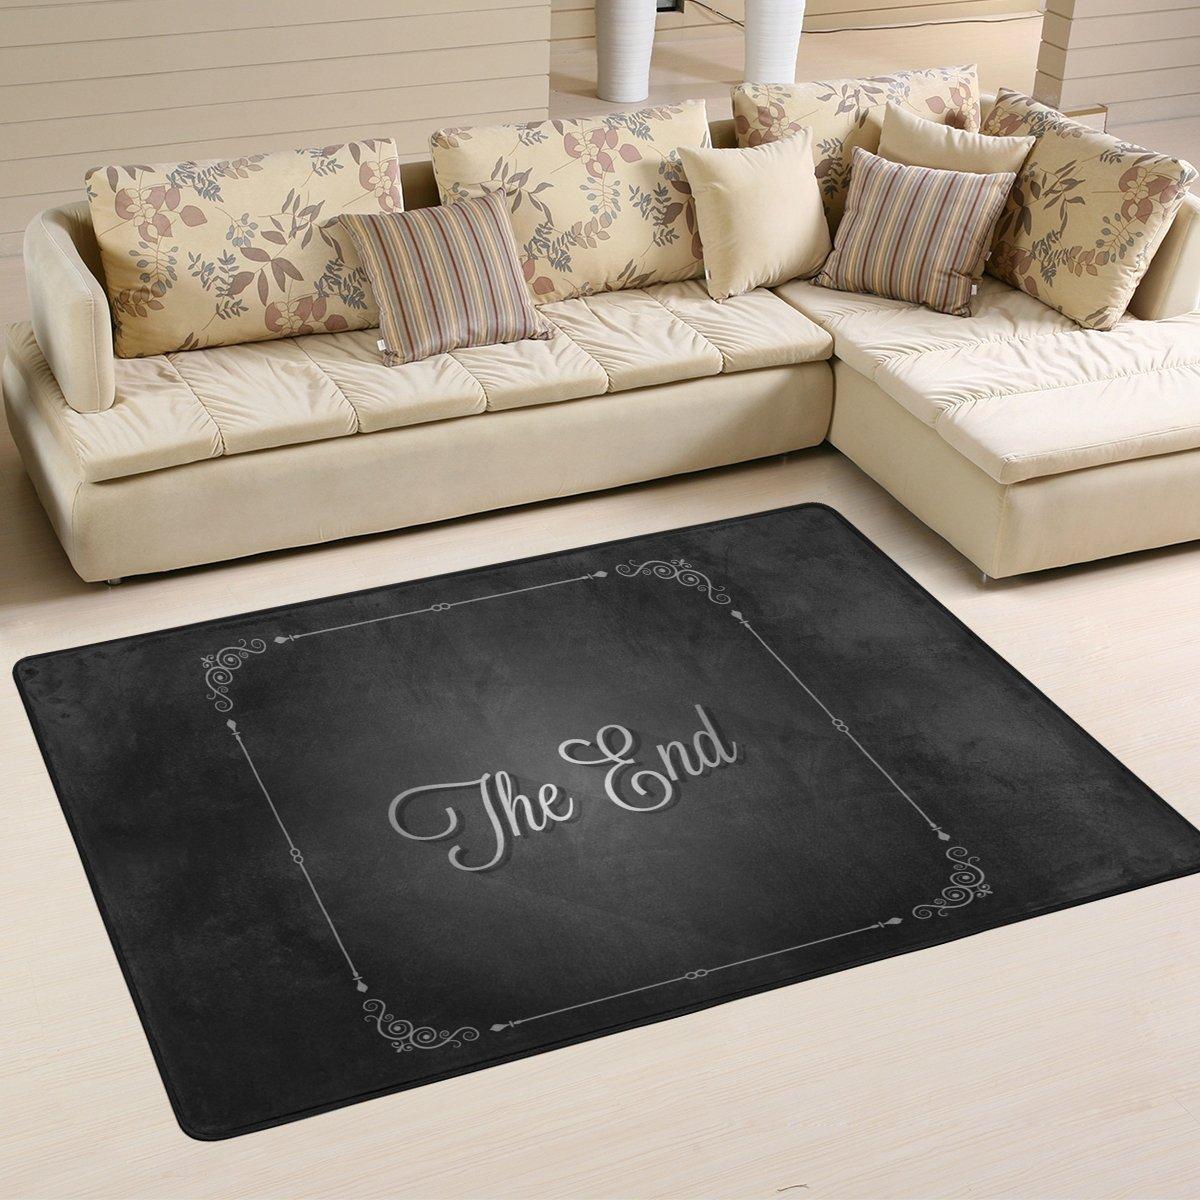 DEYYA Movie Ending Screen Griphic Print Sofa Area Rug Carpet Non-Slip Floor Mat Doormats for Living Room Bedroom 36 x 24 inches